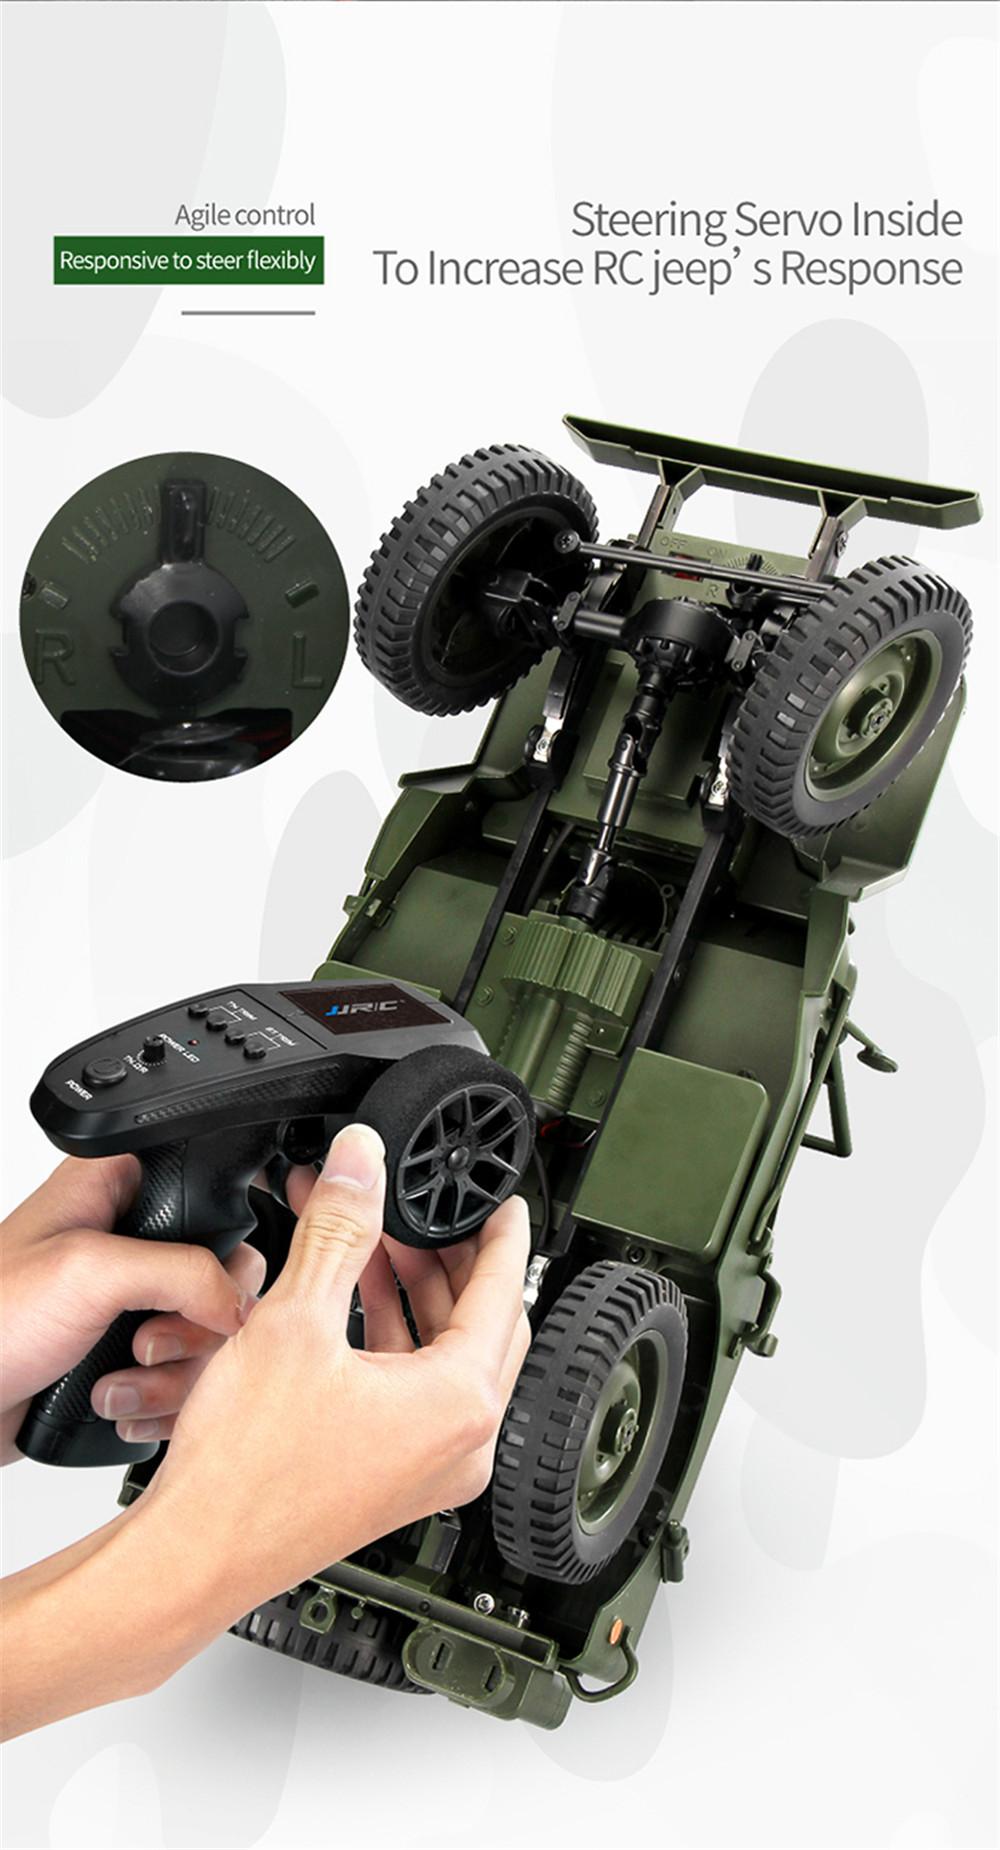 CES NEWS' JJRC Q65 2.4G 1/10 Jedi Proportional Control Crawler RC Car